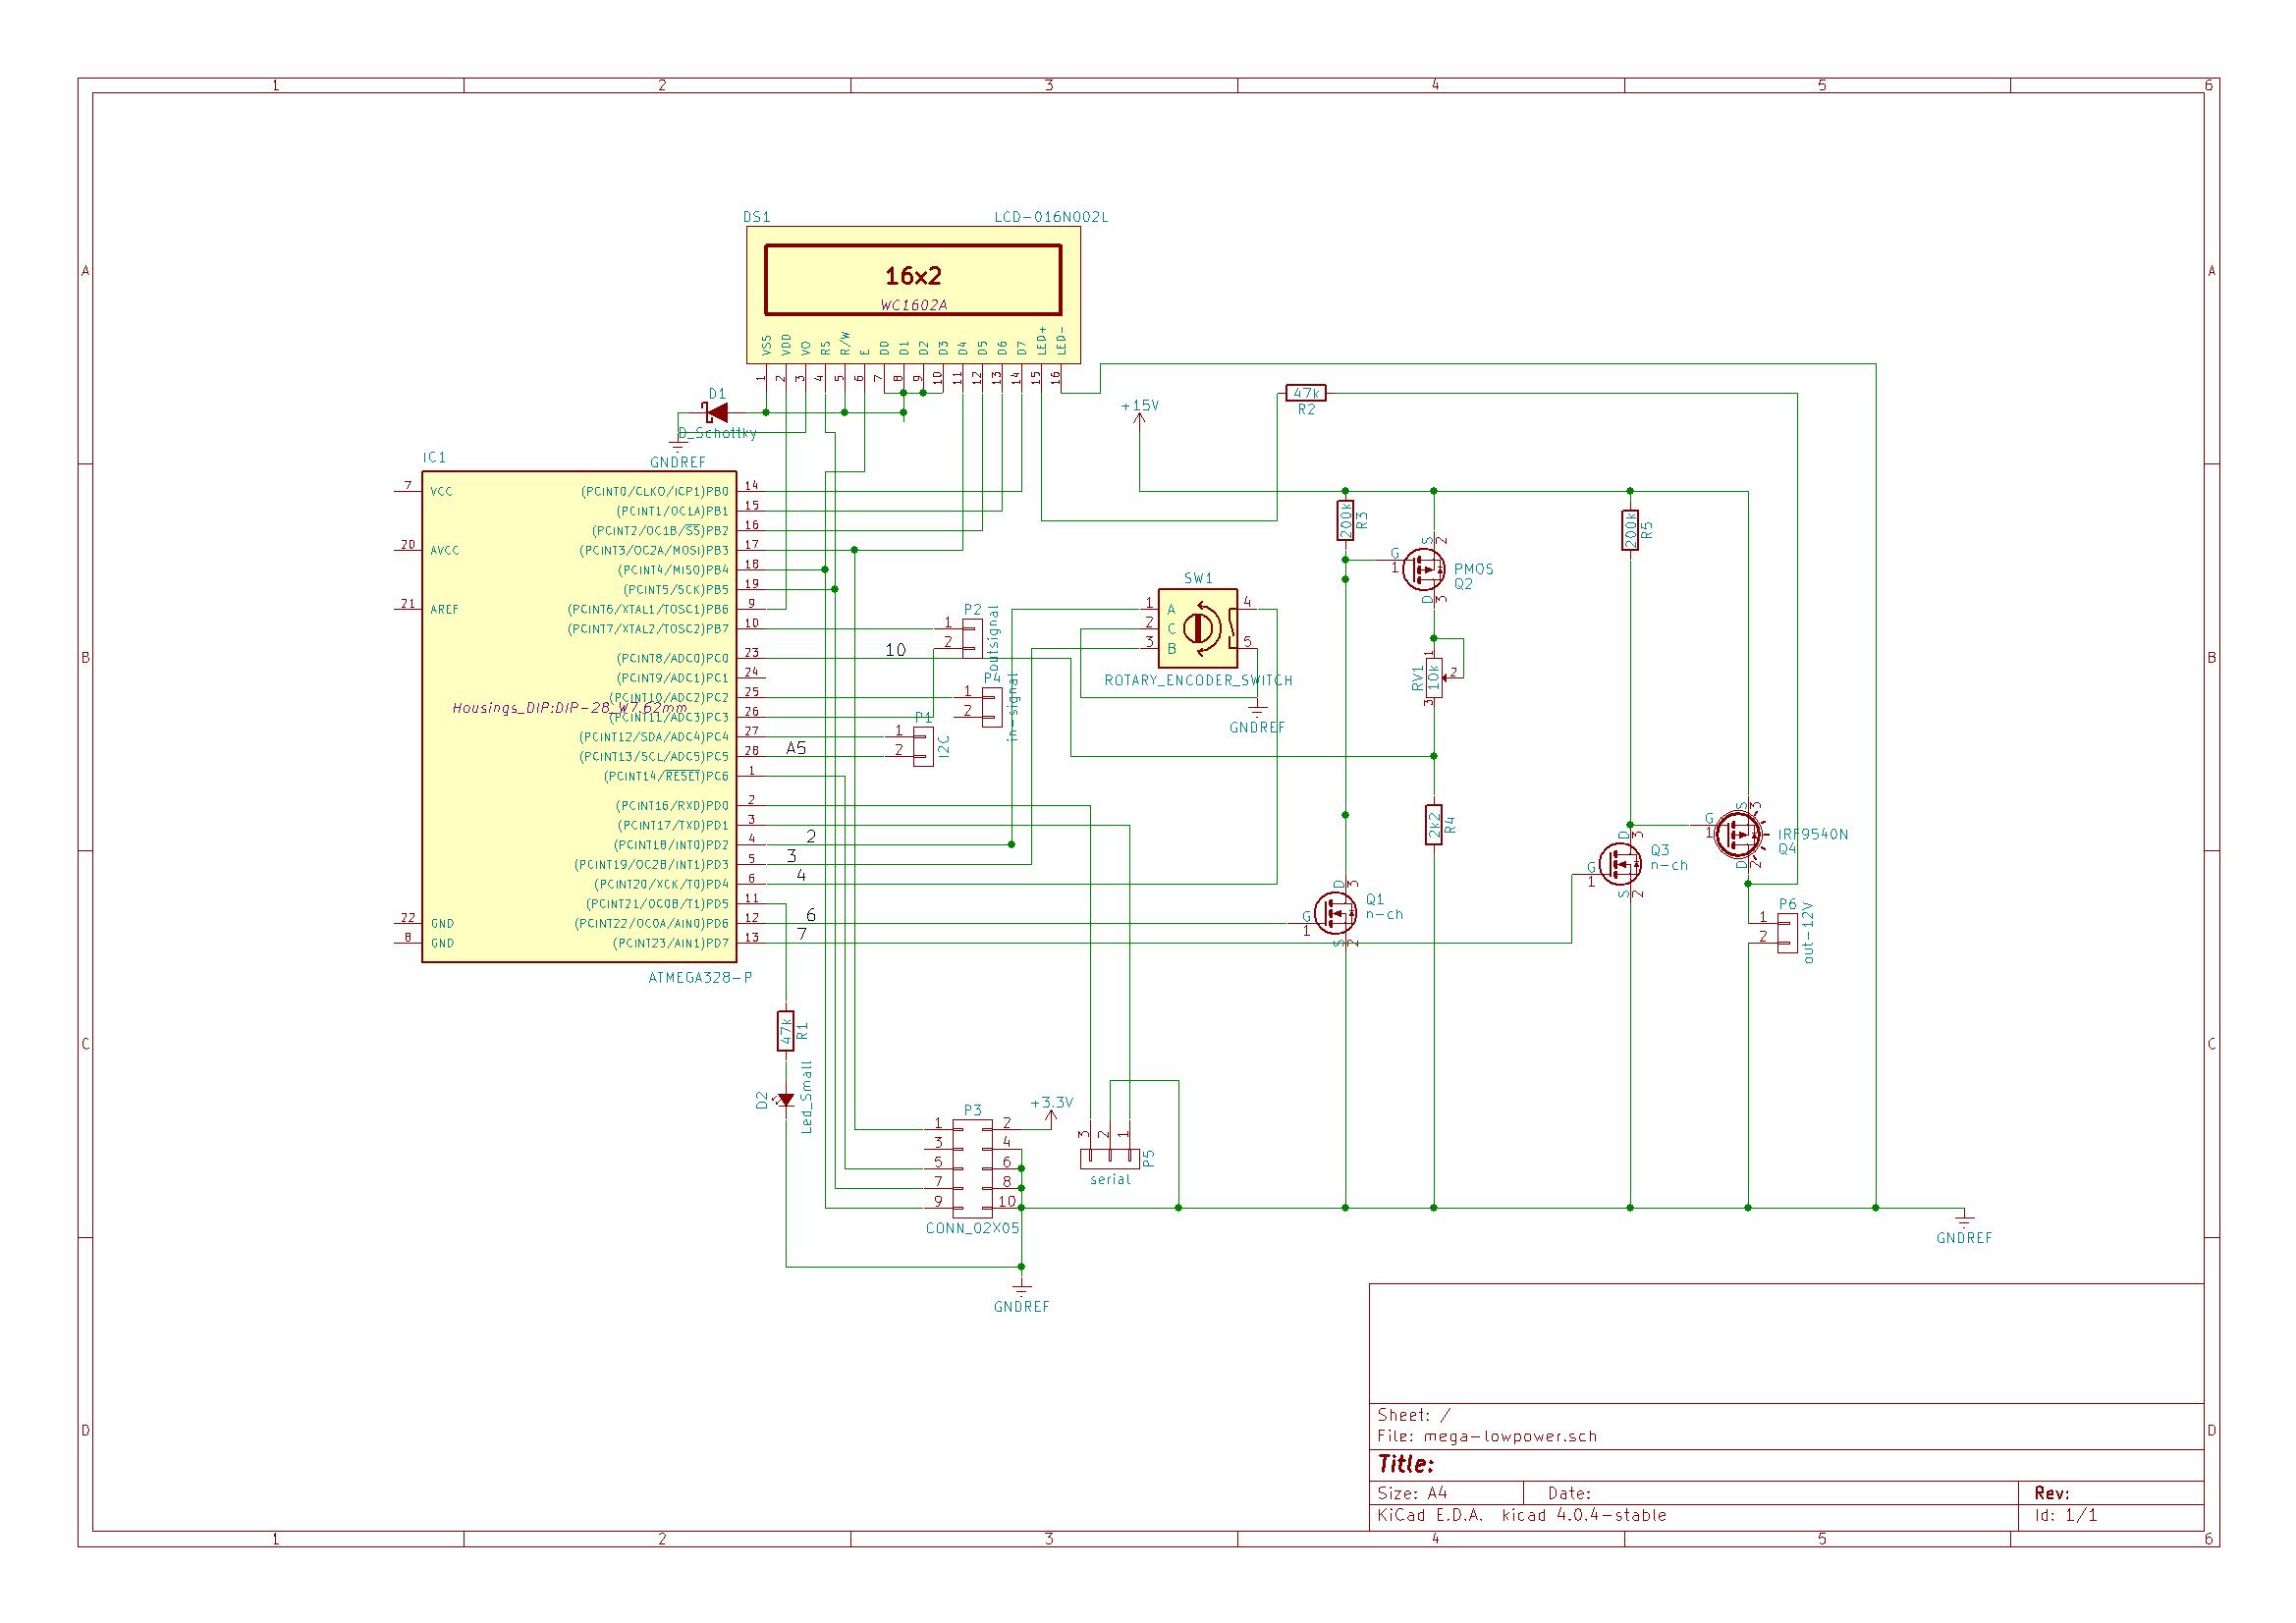 Unterspannungs Abschaltung 6V - Mikrocontroller.net